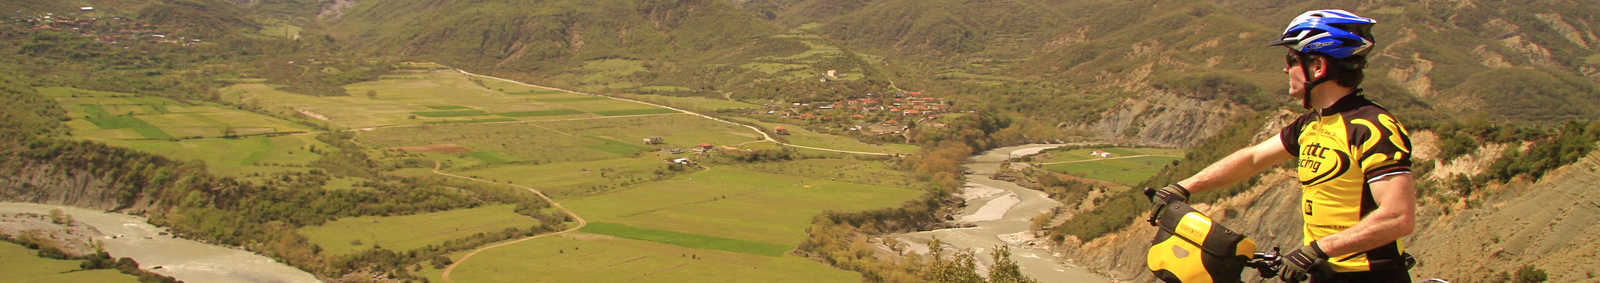 Leskovik gorge, Albania